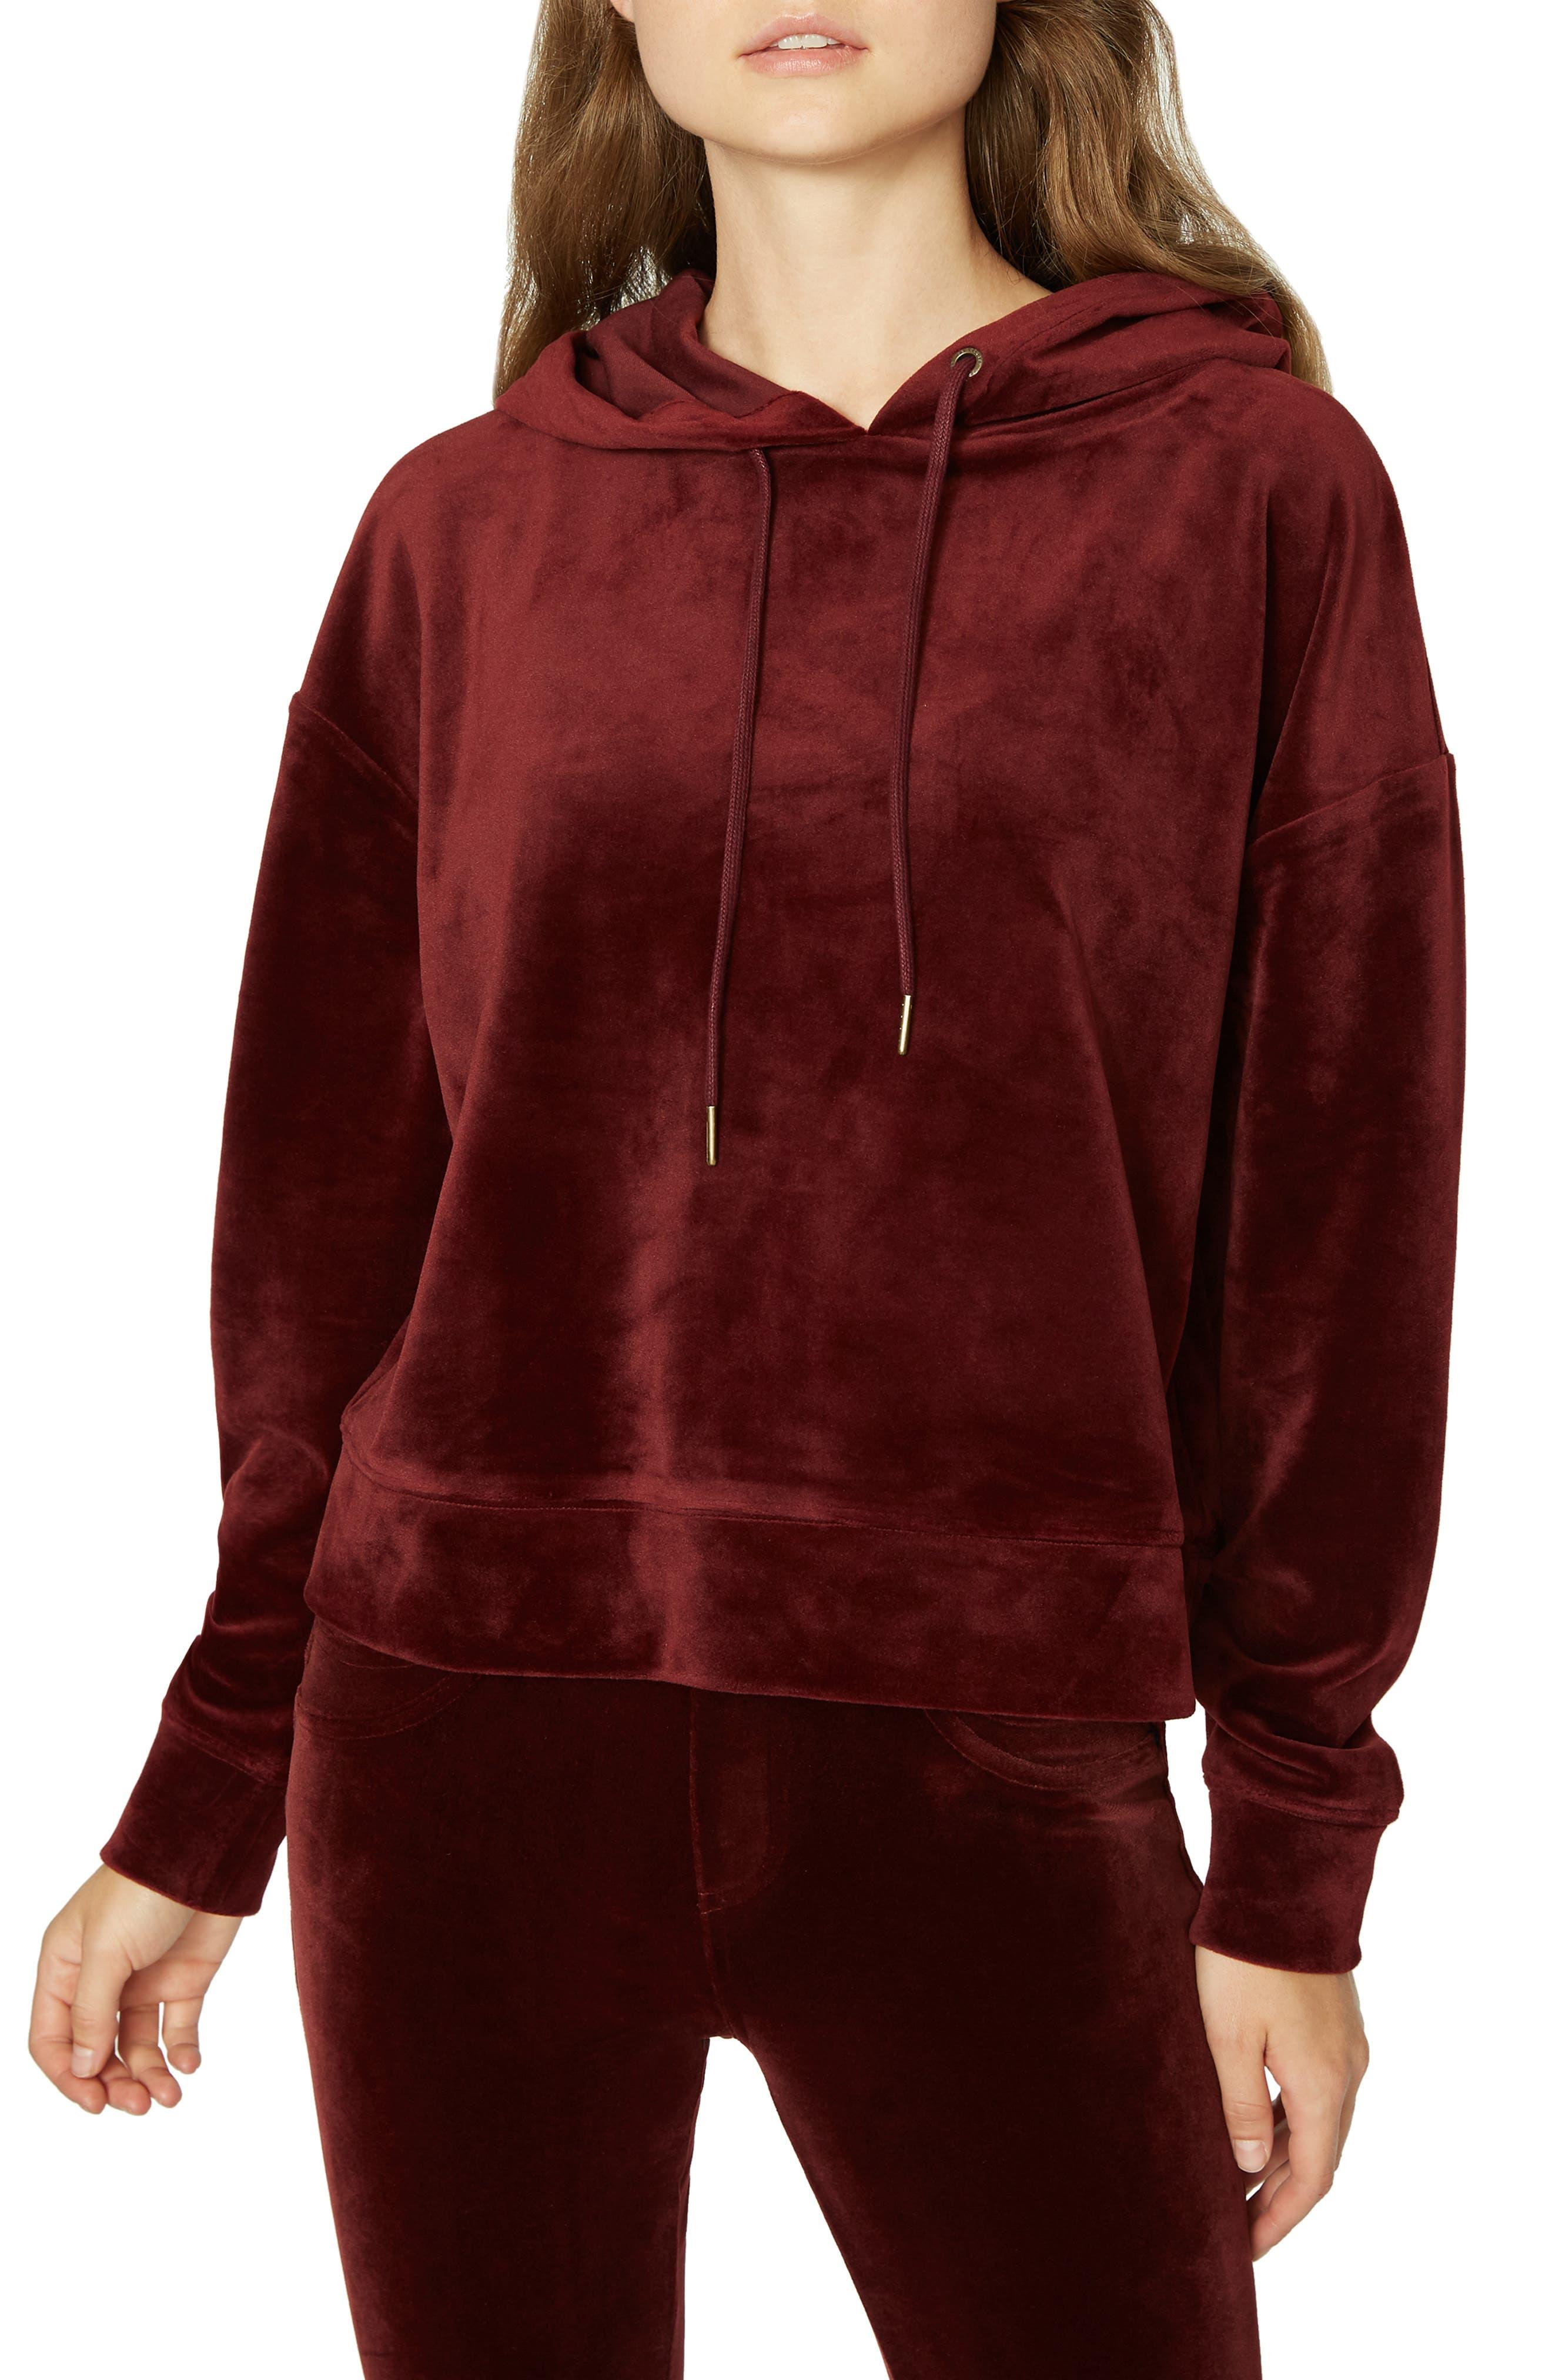 SANCTUARY Melrose Brigade Velour Hoodie Sweater, Main, color, 602